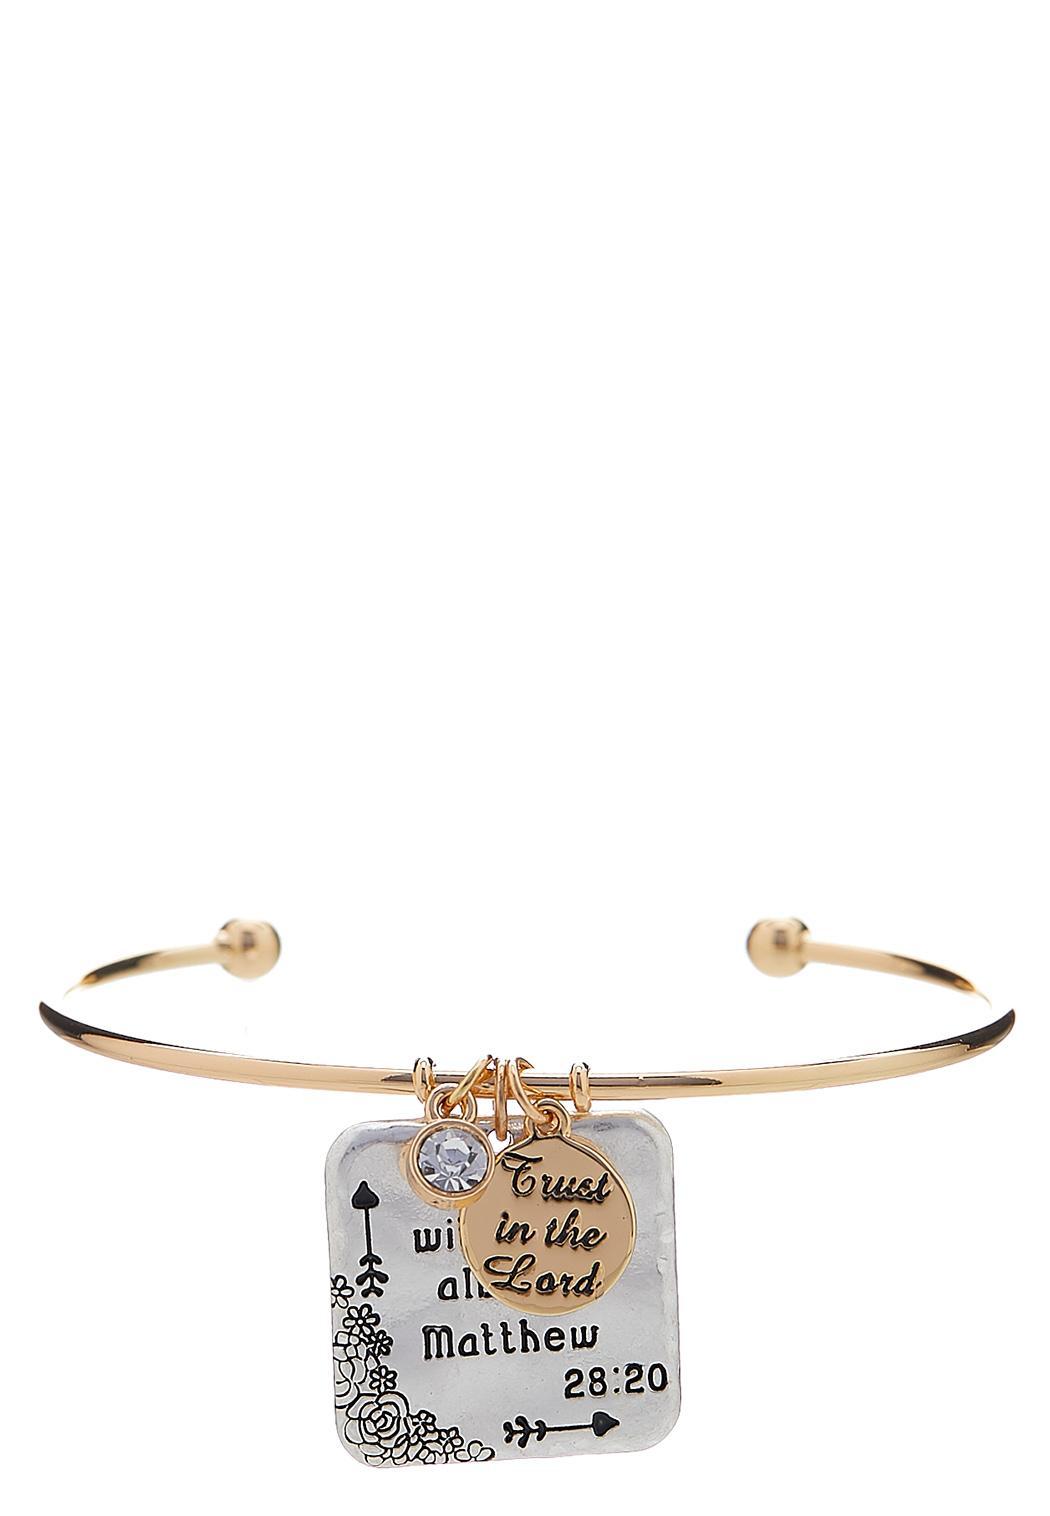 Inspirational Charm Cuff Bracelet